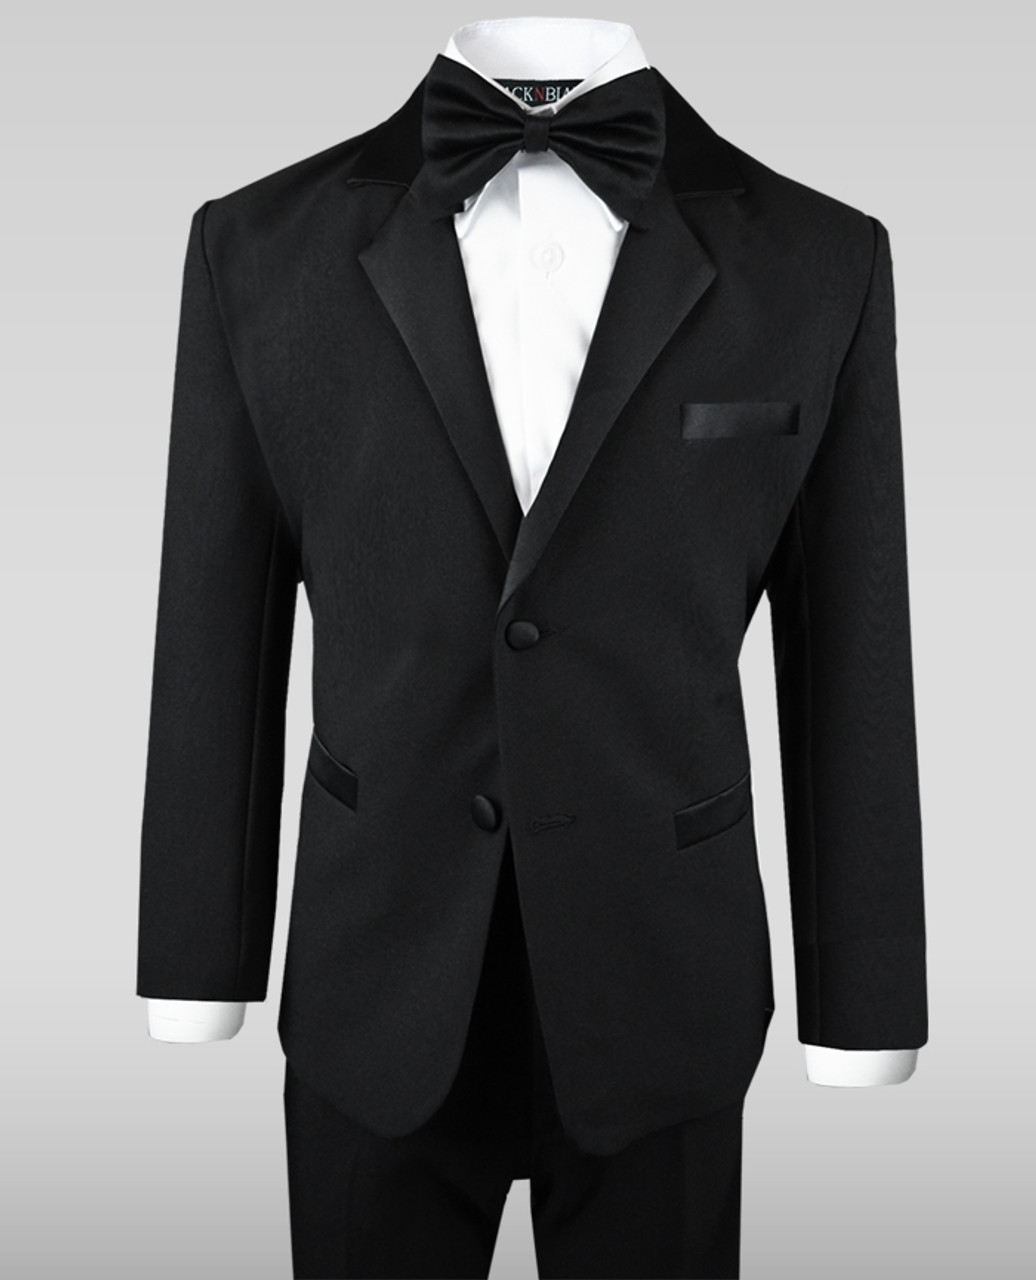 TUXXMAN New Boys Black Bow Tie Tuxedo Satin Pre Tied Formal Tux Shirt U.S.A